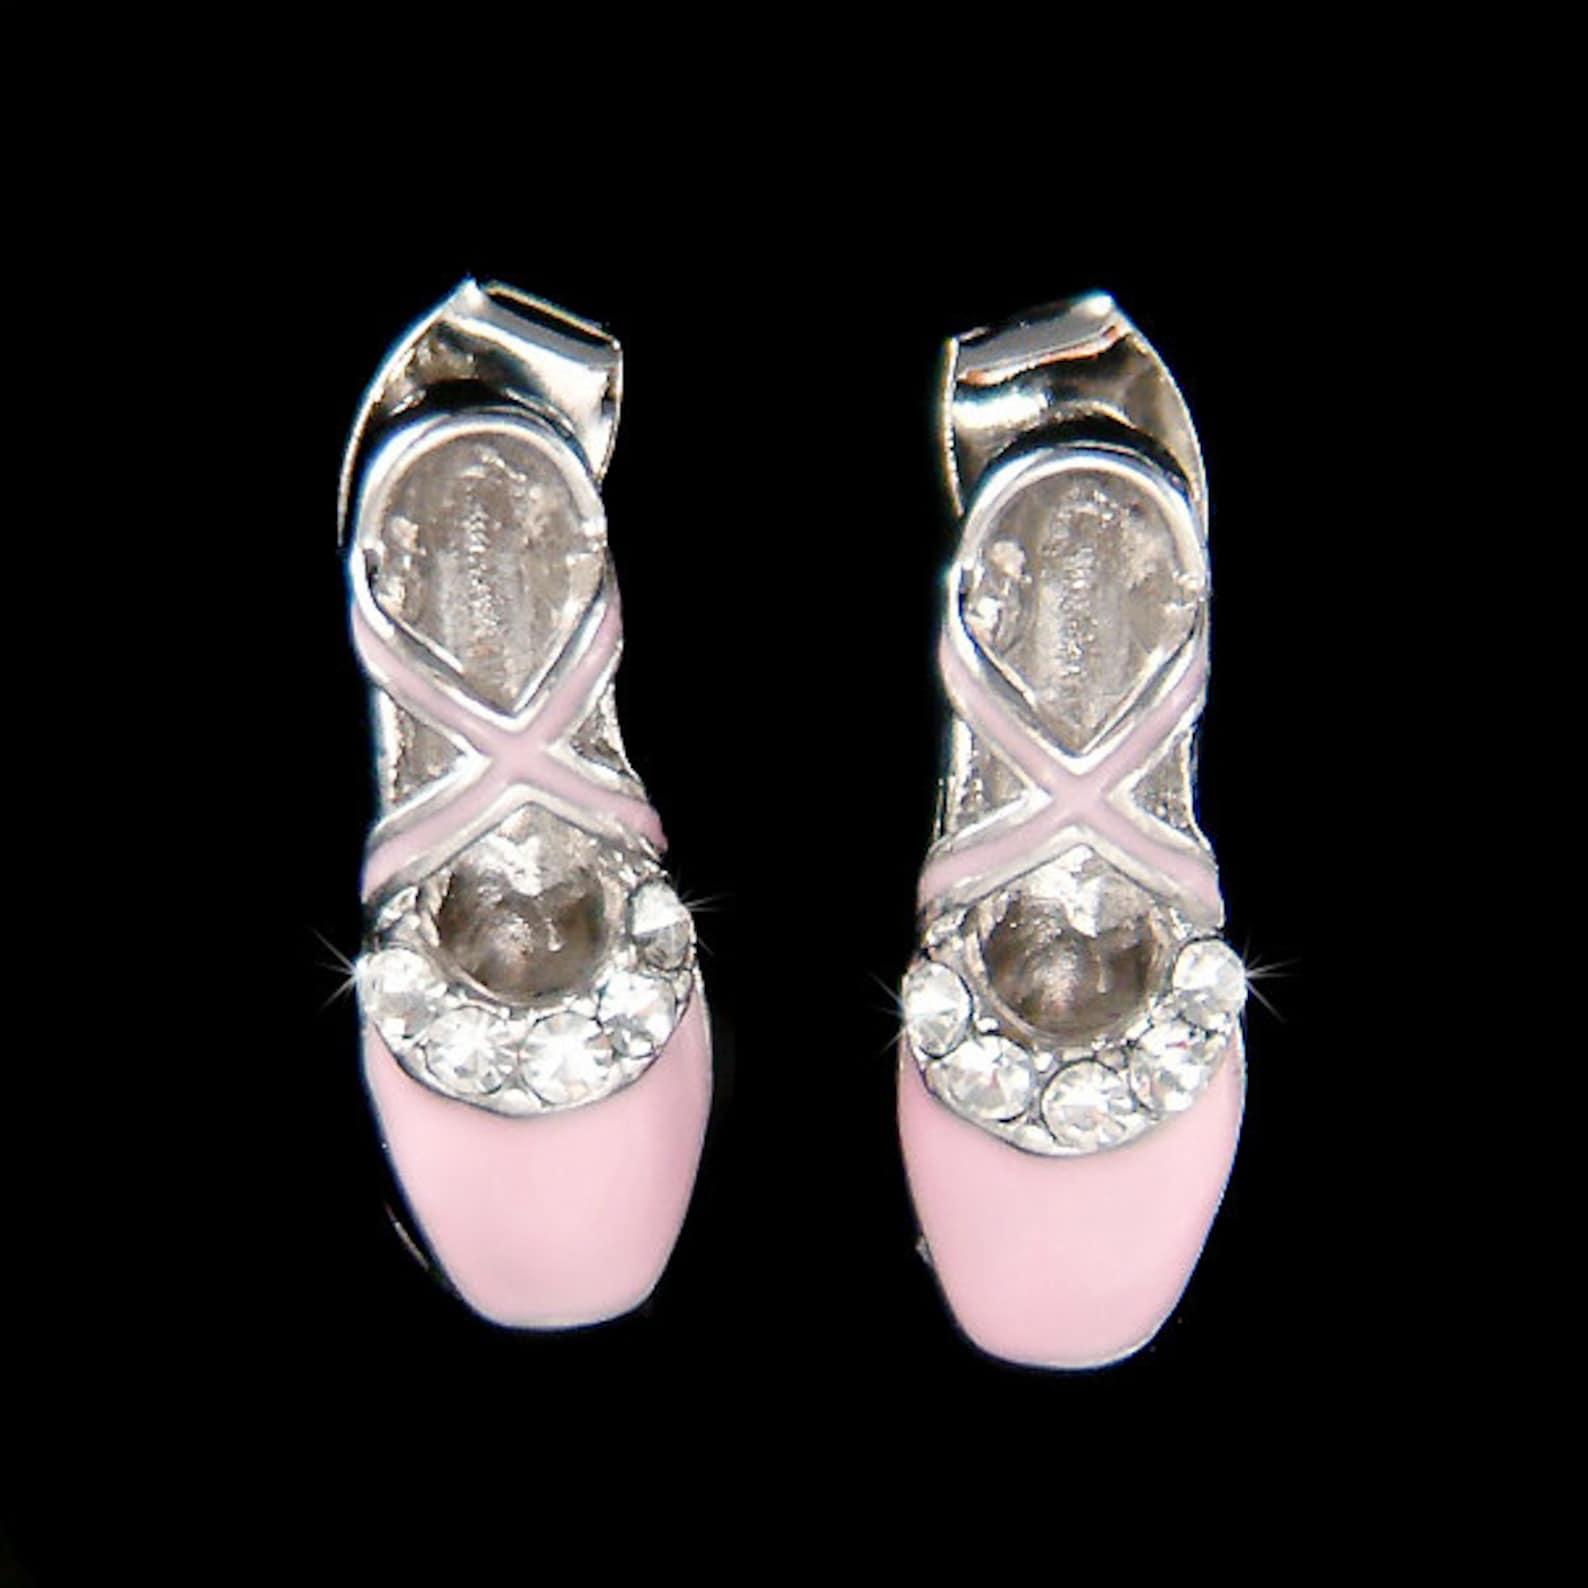 swarovski crystal pink enamel paint ballerina shoes slippers ballet dance earrings christmas gift new jewelry the nutcracker swa